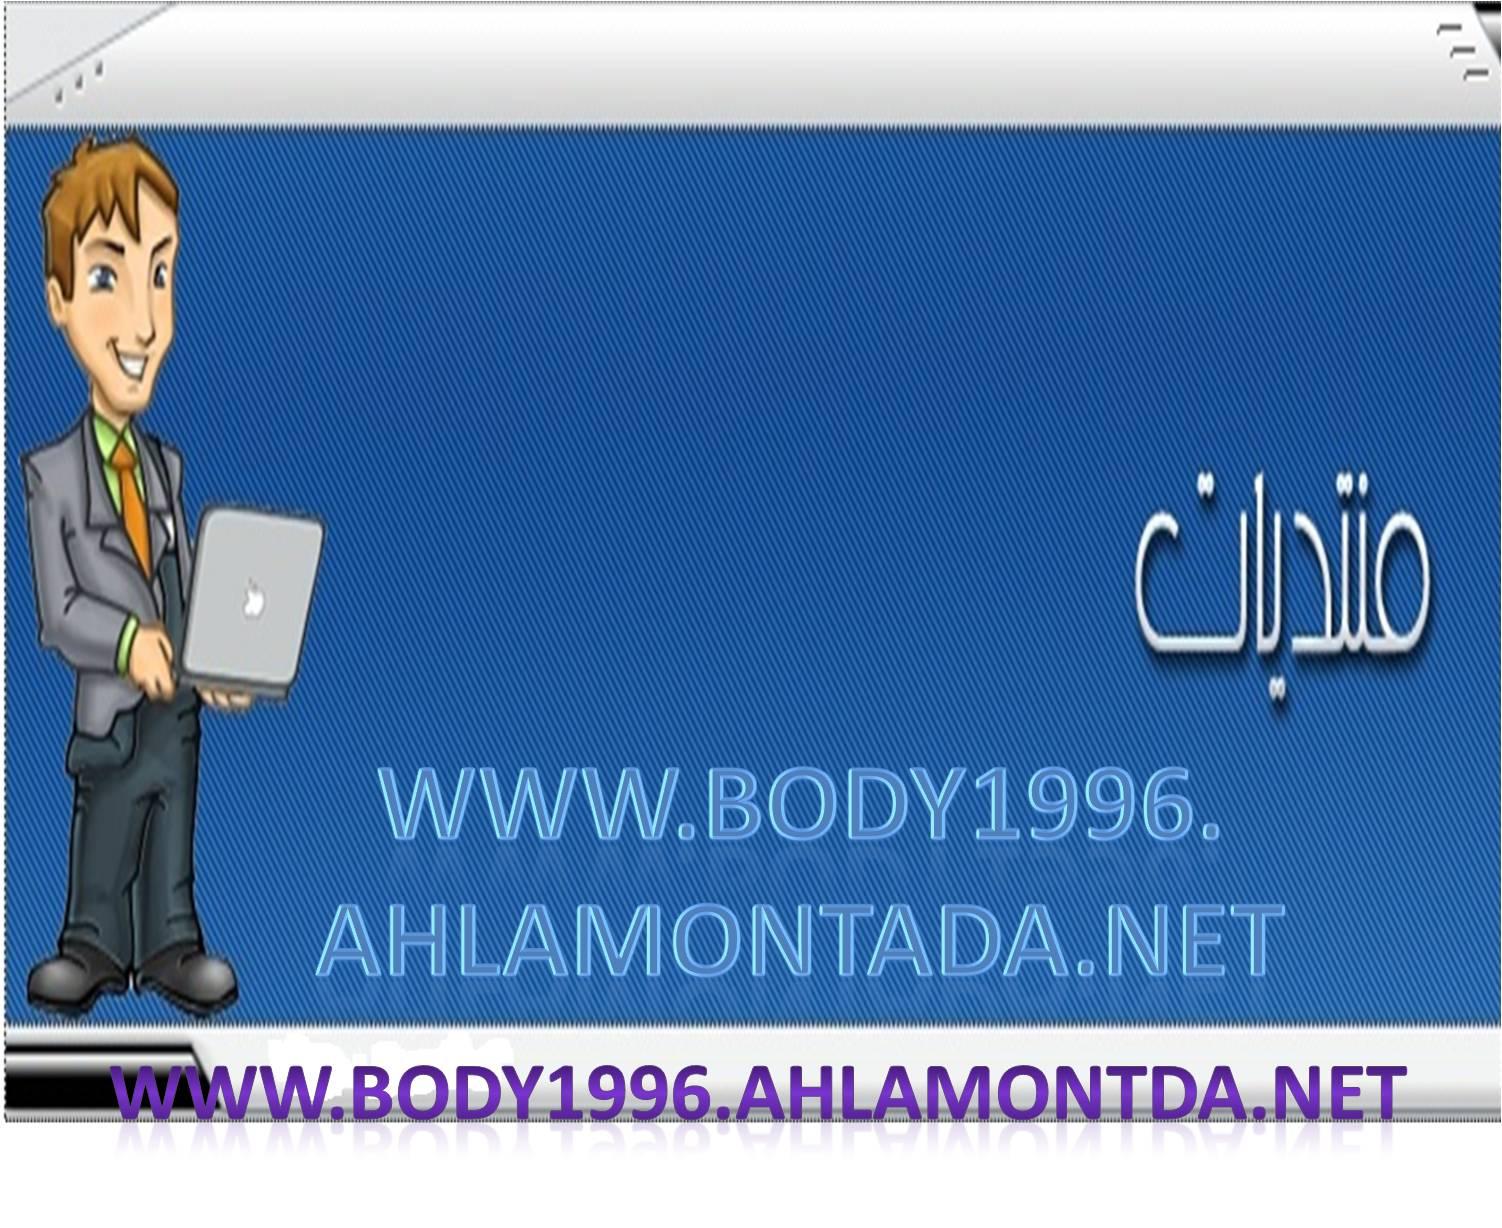 www.body1996.ahlamontada.net